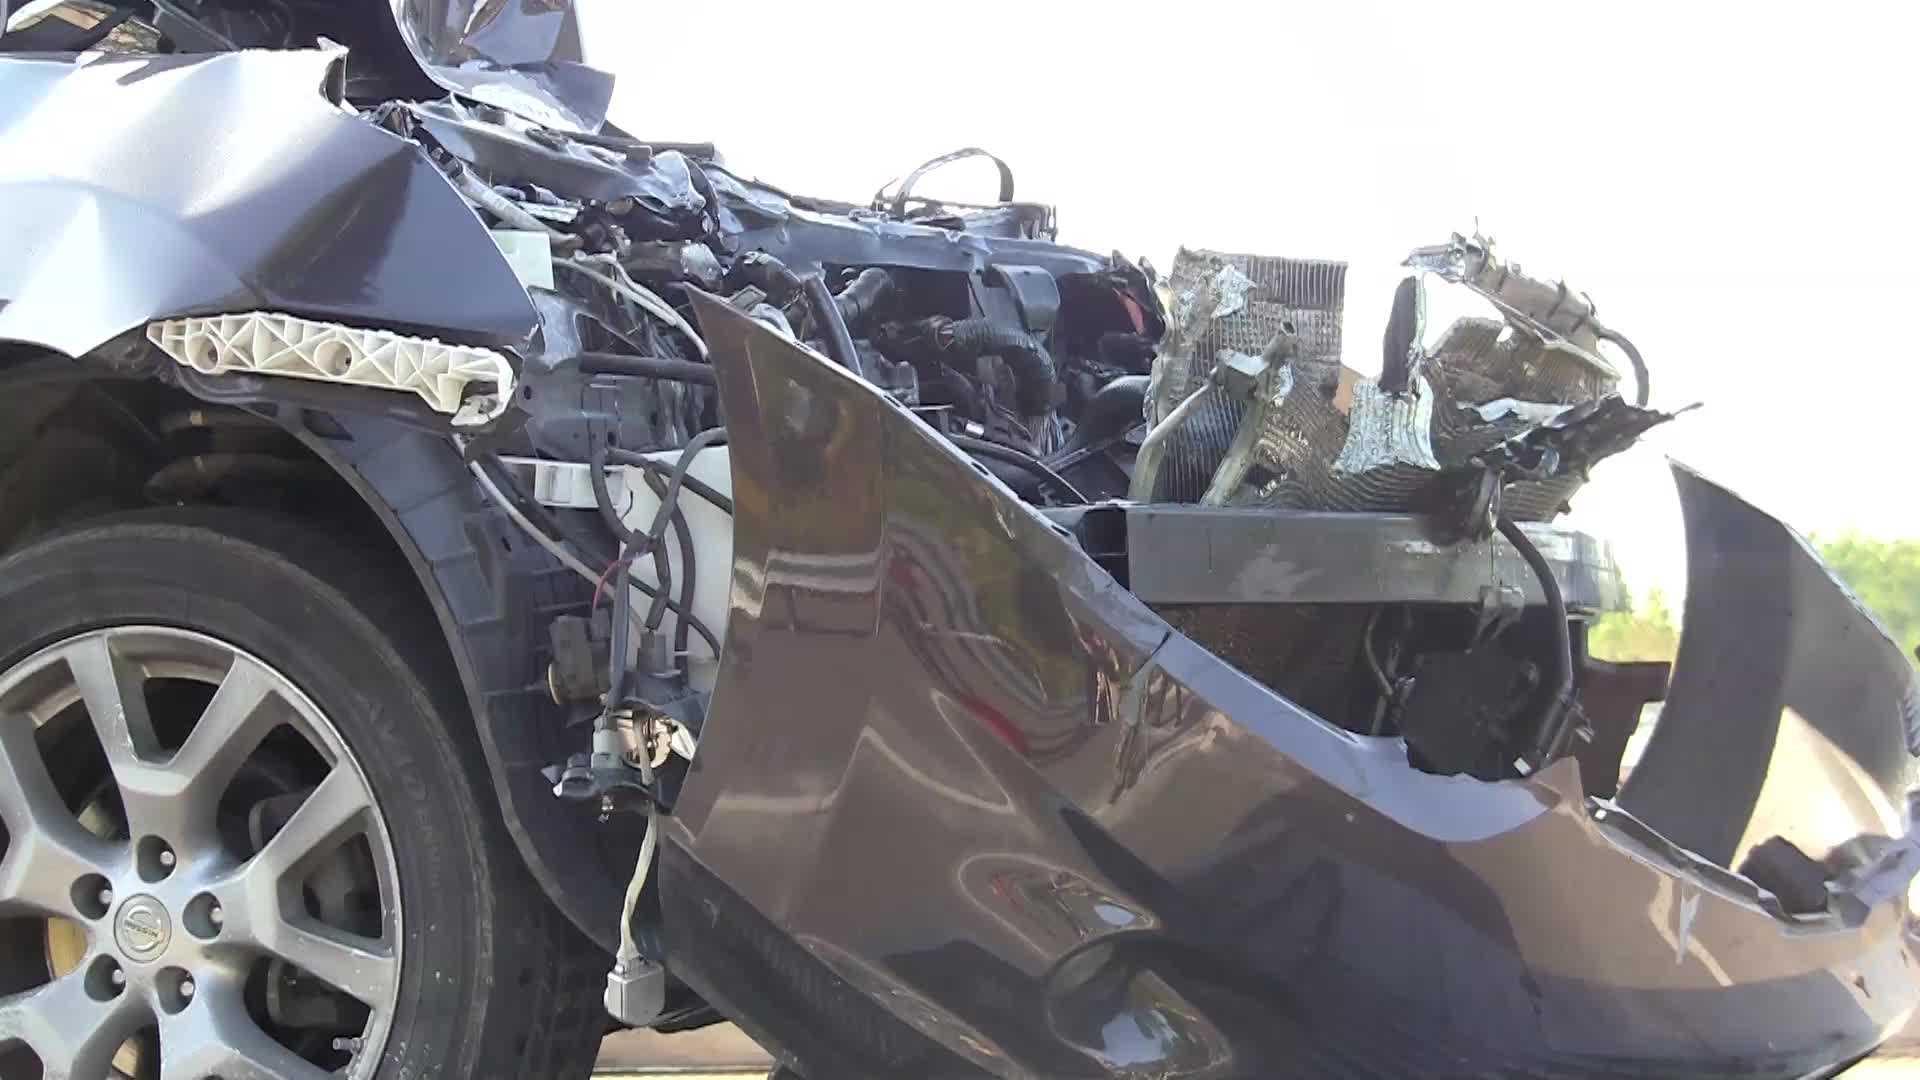 North Sewickley crash